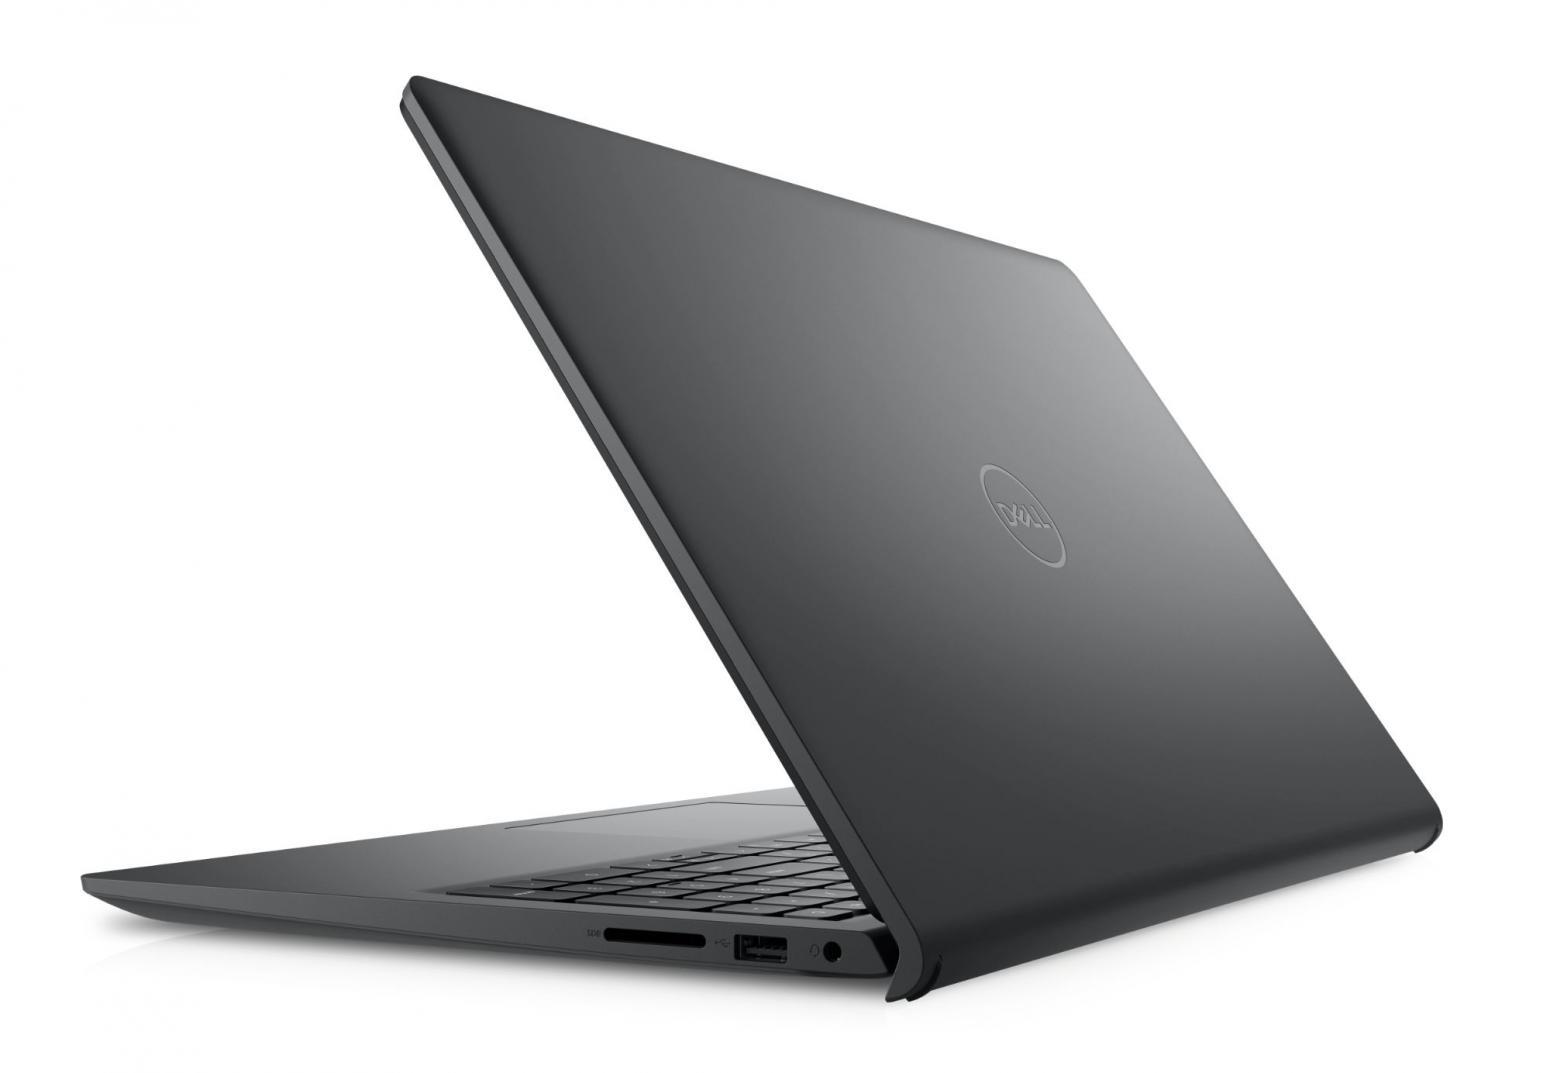 Ordinateur portable Dell Inspiron 15 3511 Noir - i3, Intel G4, SSD 256 Go - photo 3